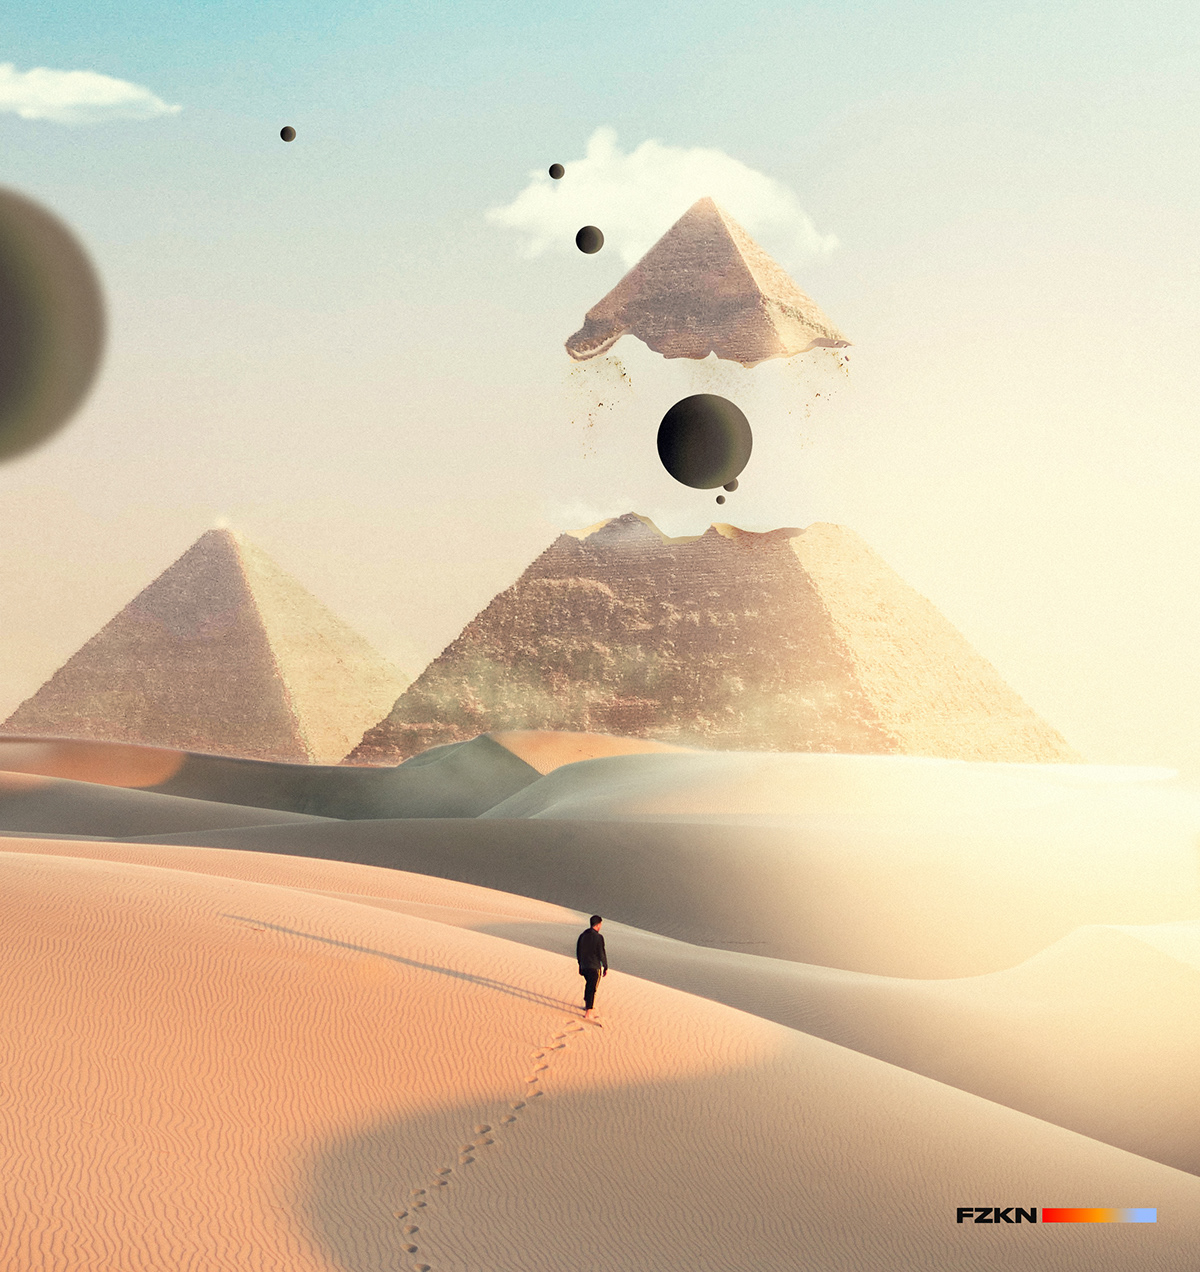 abstract concept art desert digitalart fantasy photomanipulation photoshop photoshopmix surreal